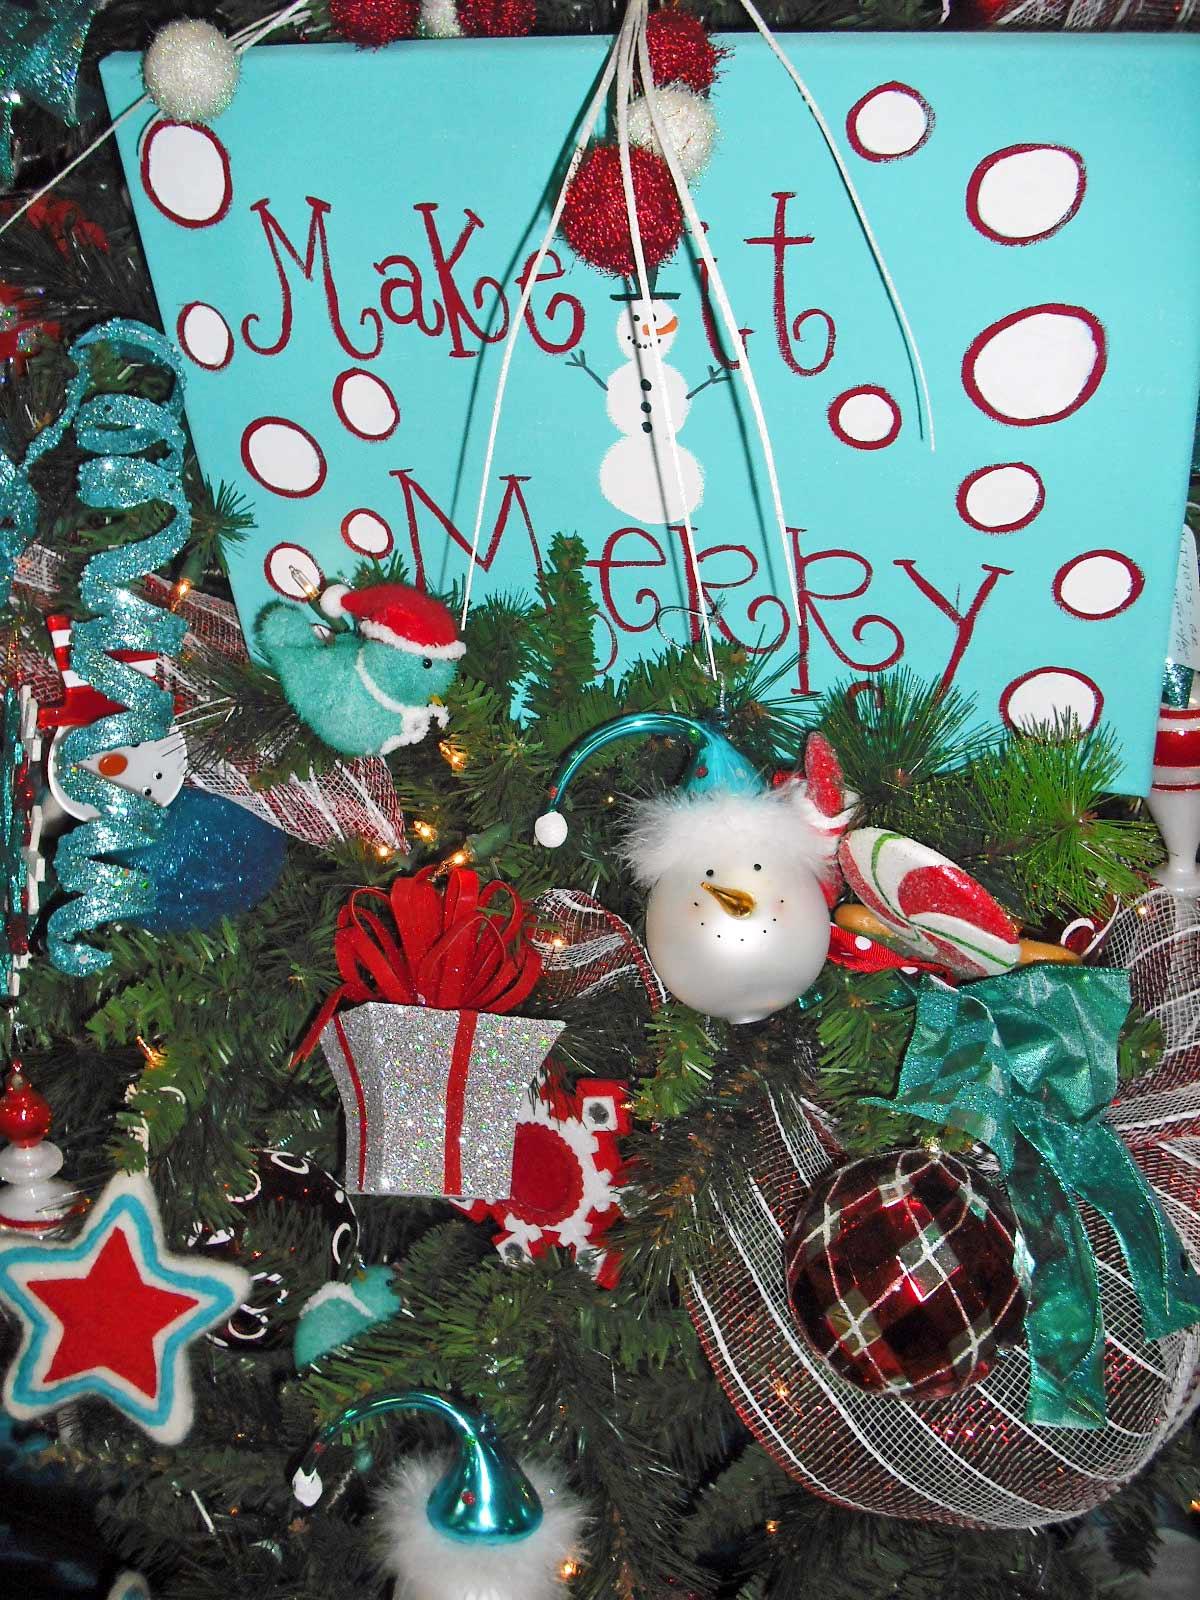 Studio B (UberArt): Twelve Days of Christmas Trees: Day 4